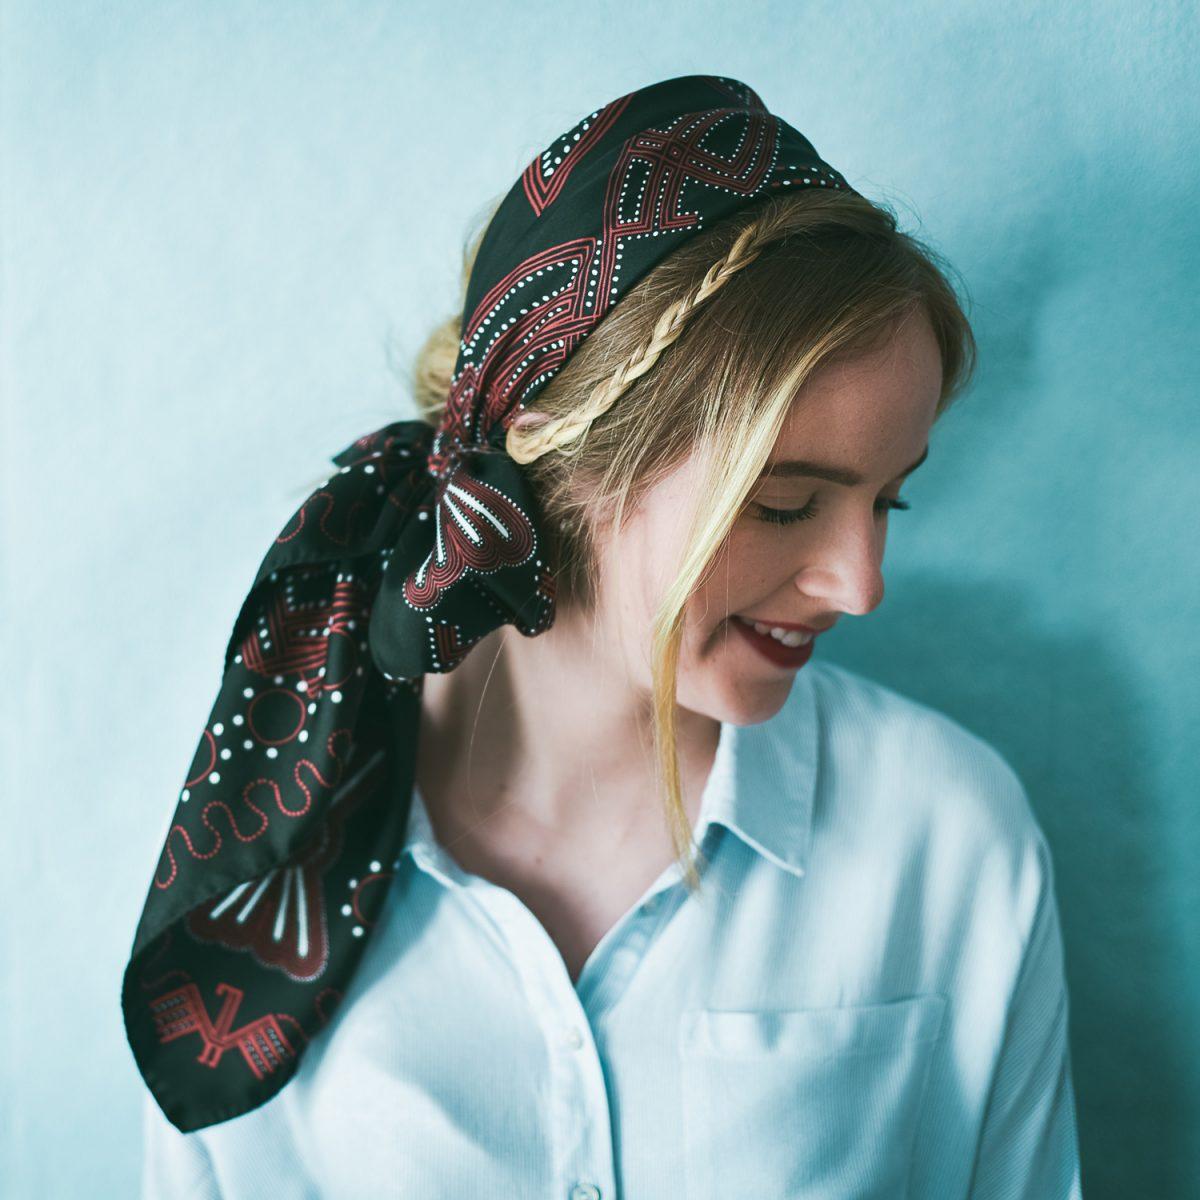 Âmulet Foulard Messenger Black Hawk fashion headwrapped style